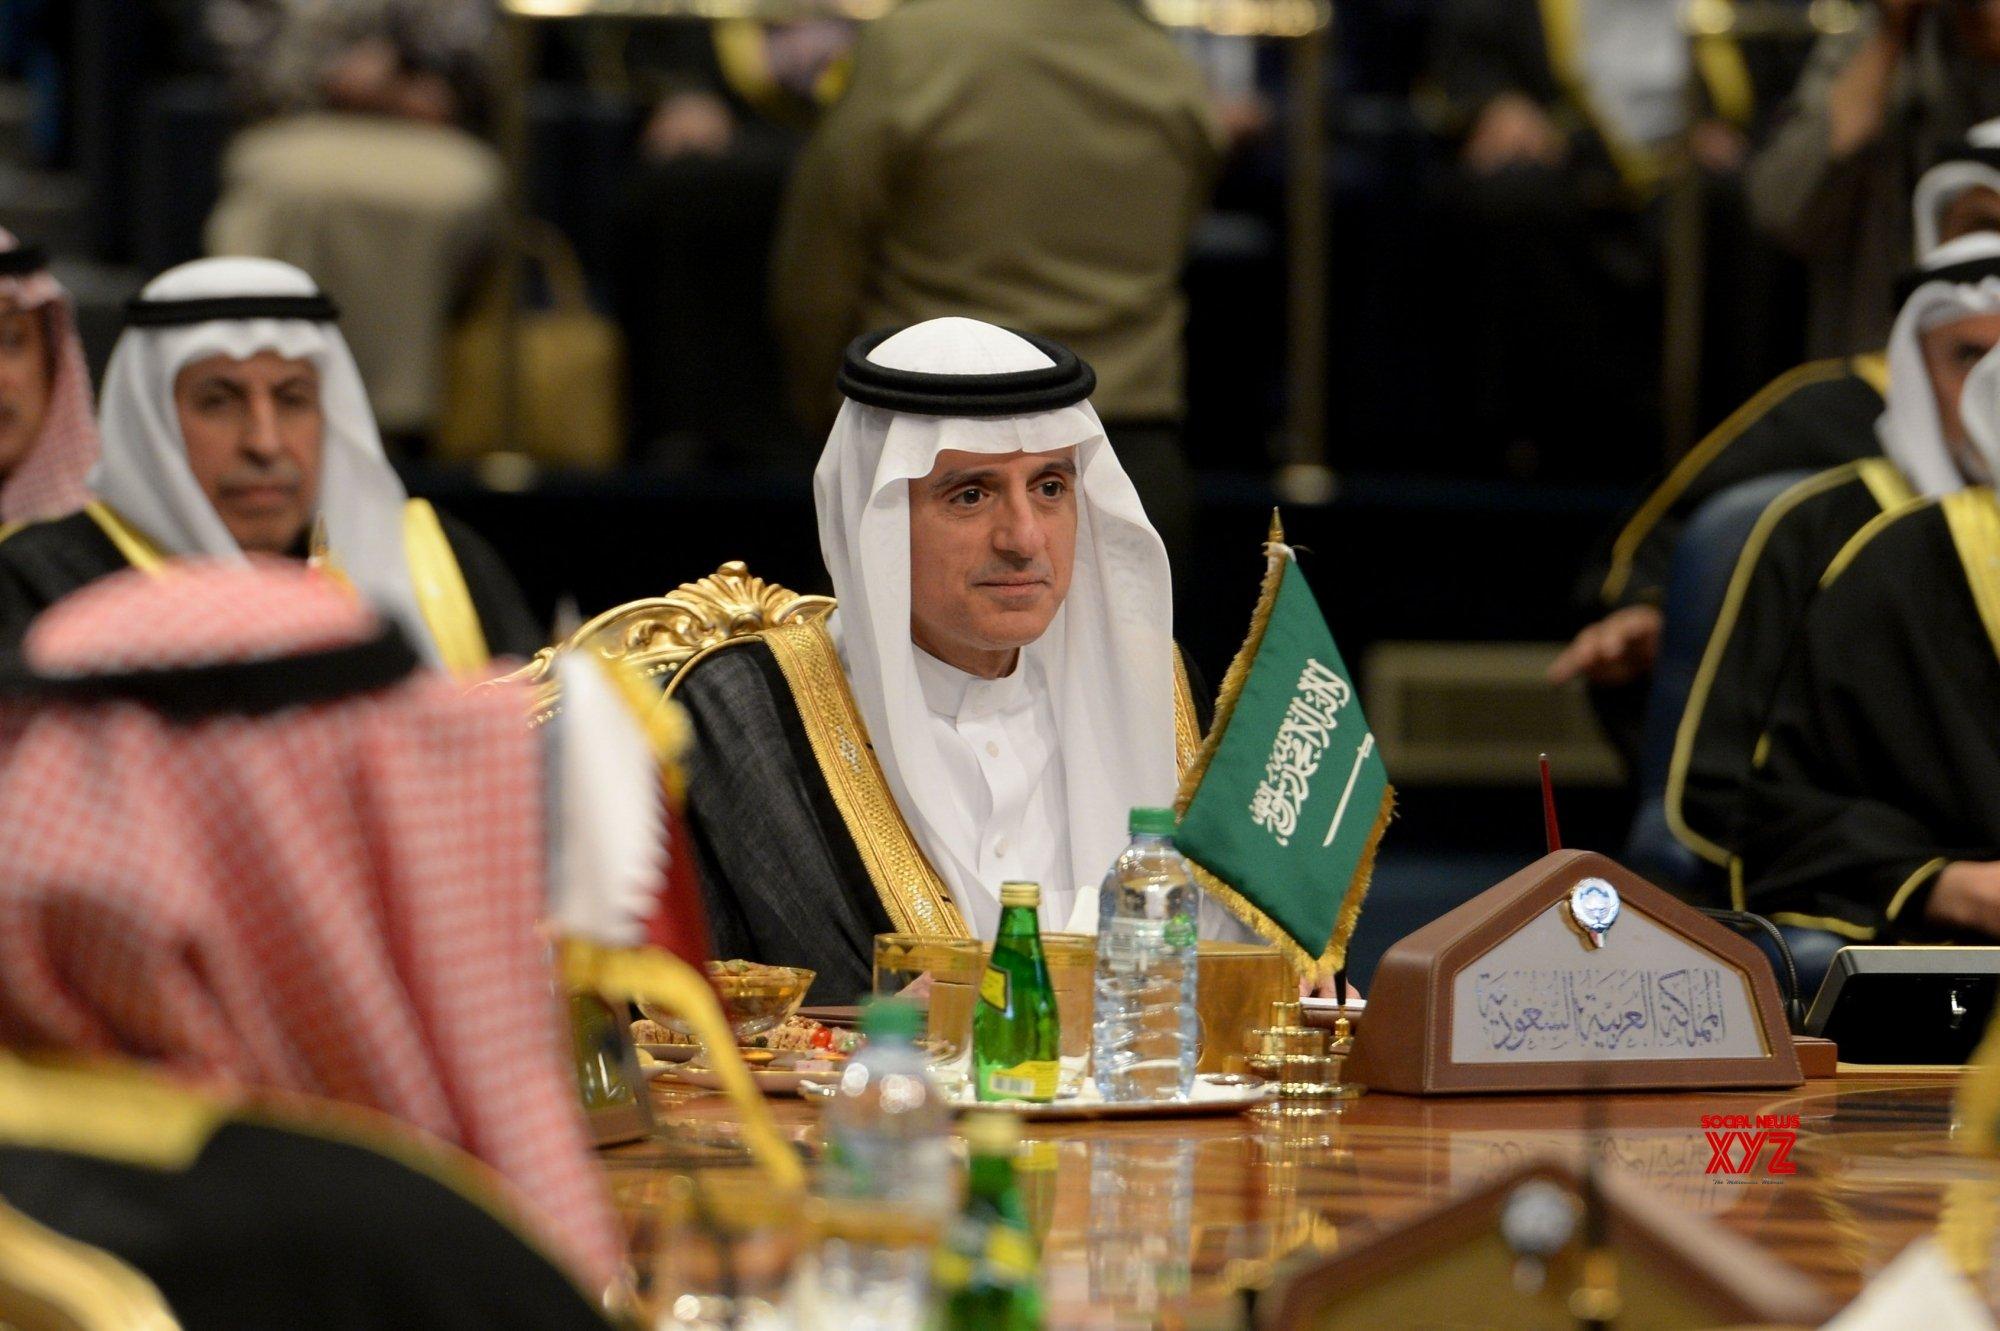 Saudis don't know where Khashoggi's body is: Minister